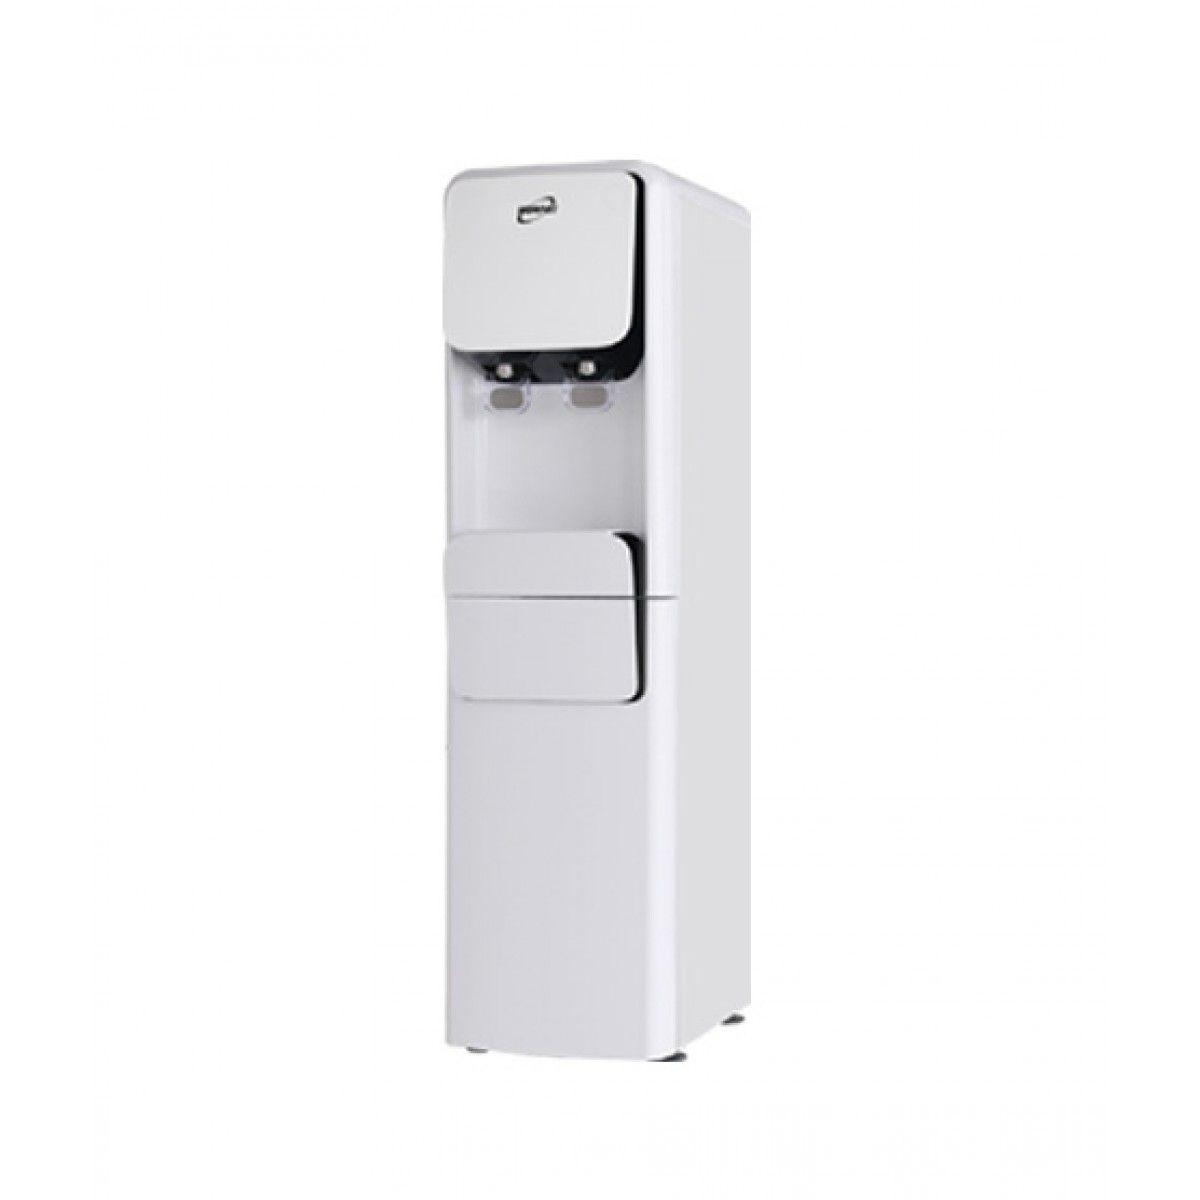 Homage 2 Taps HWD-71 Water Dispenser